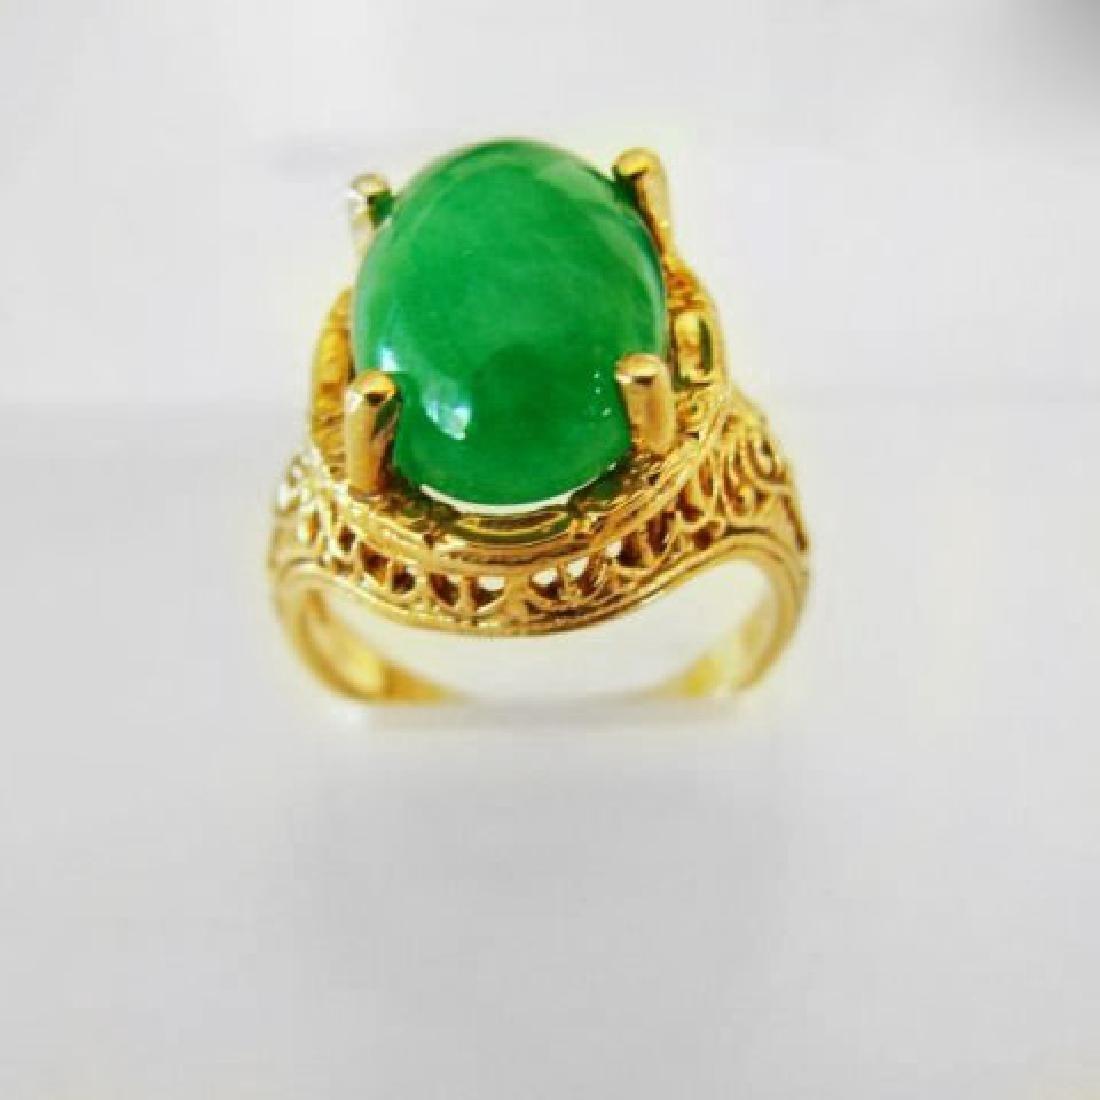 Antique Ring Jadeite Jade 6.82 Carat 18k Yellow Gold - 2